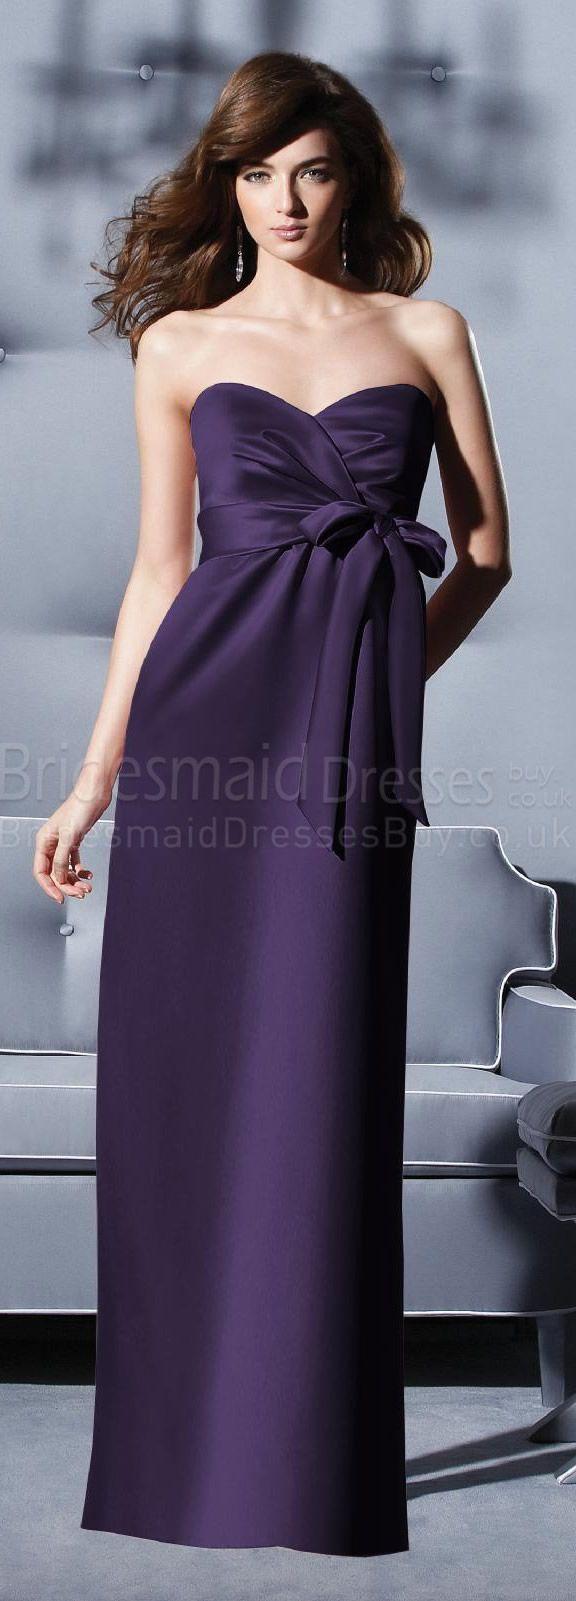 purple bridesmaid dress,long bridesmaid dresses,long purple ...